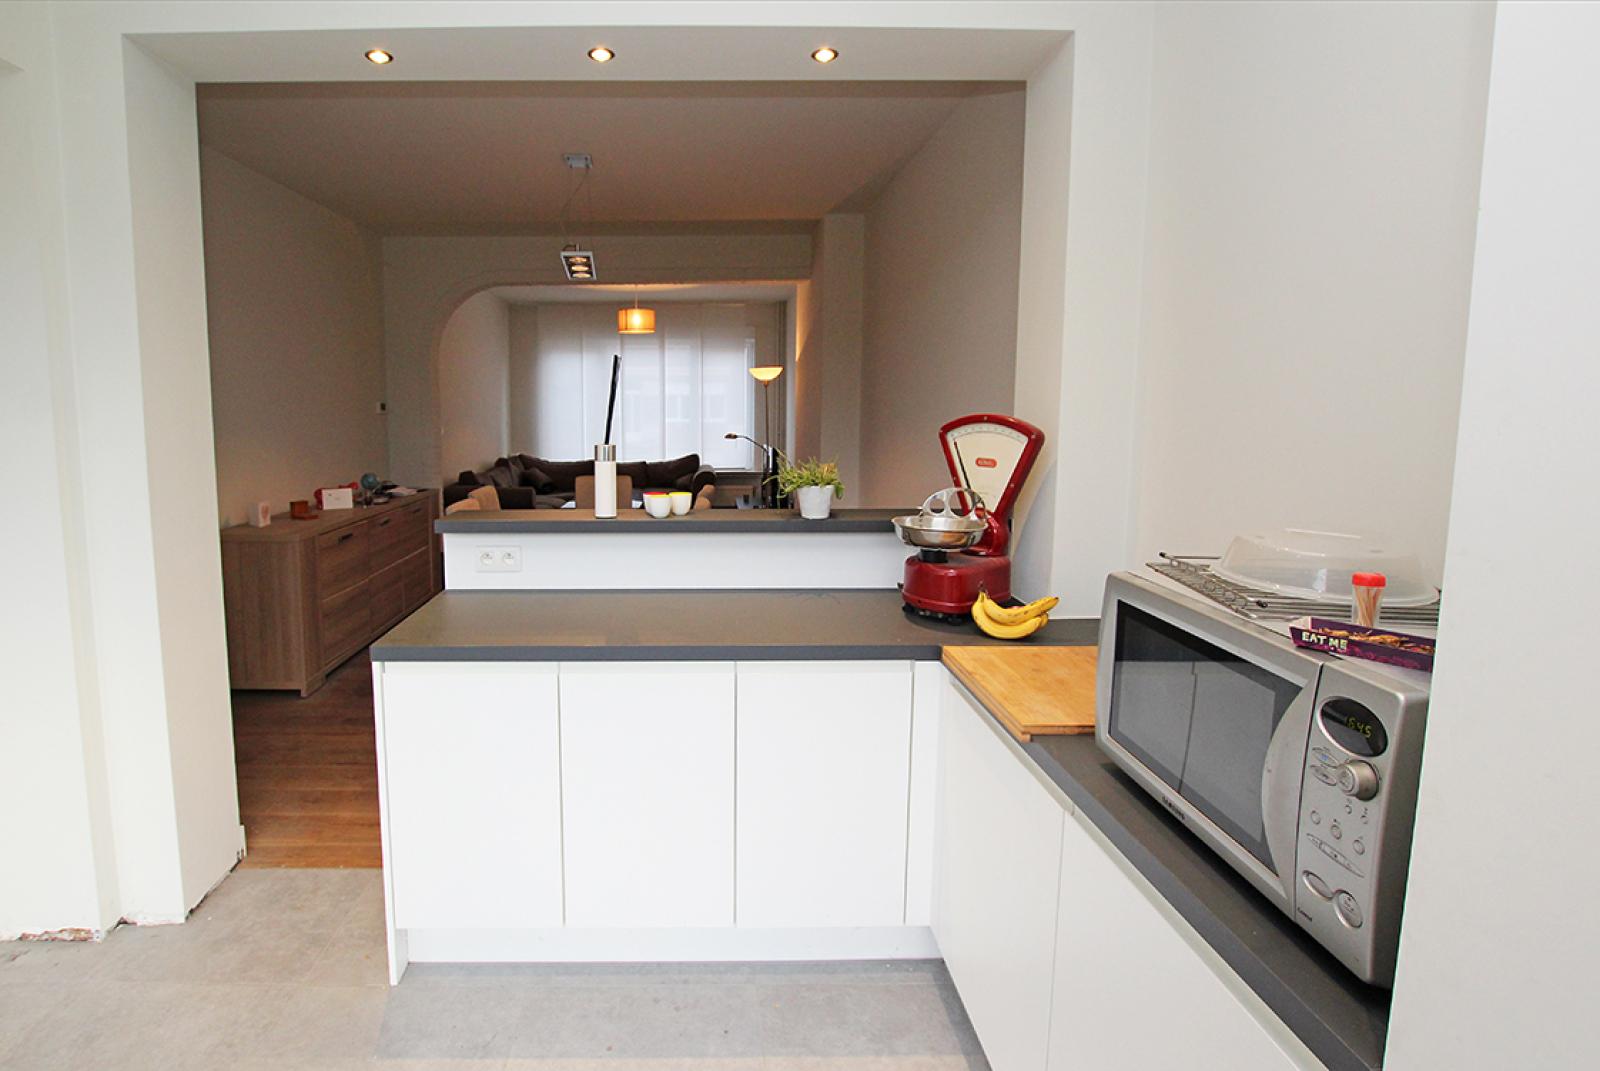 Ruime eengezinswoning met inpandige garage, 3 slaapkamers en tuin te Mortsel! afbeelding 6